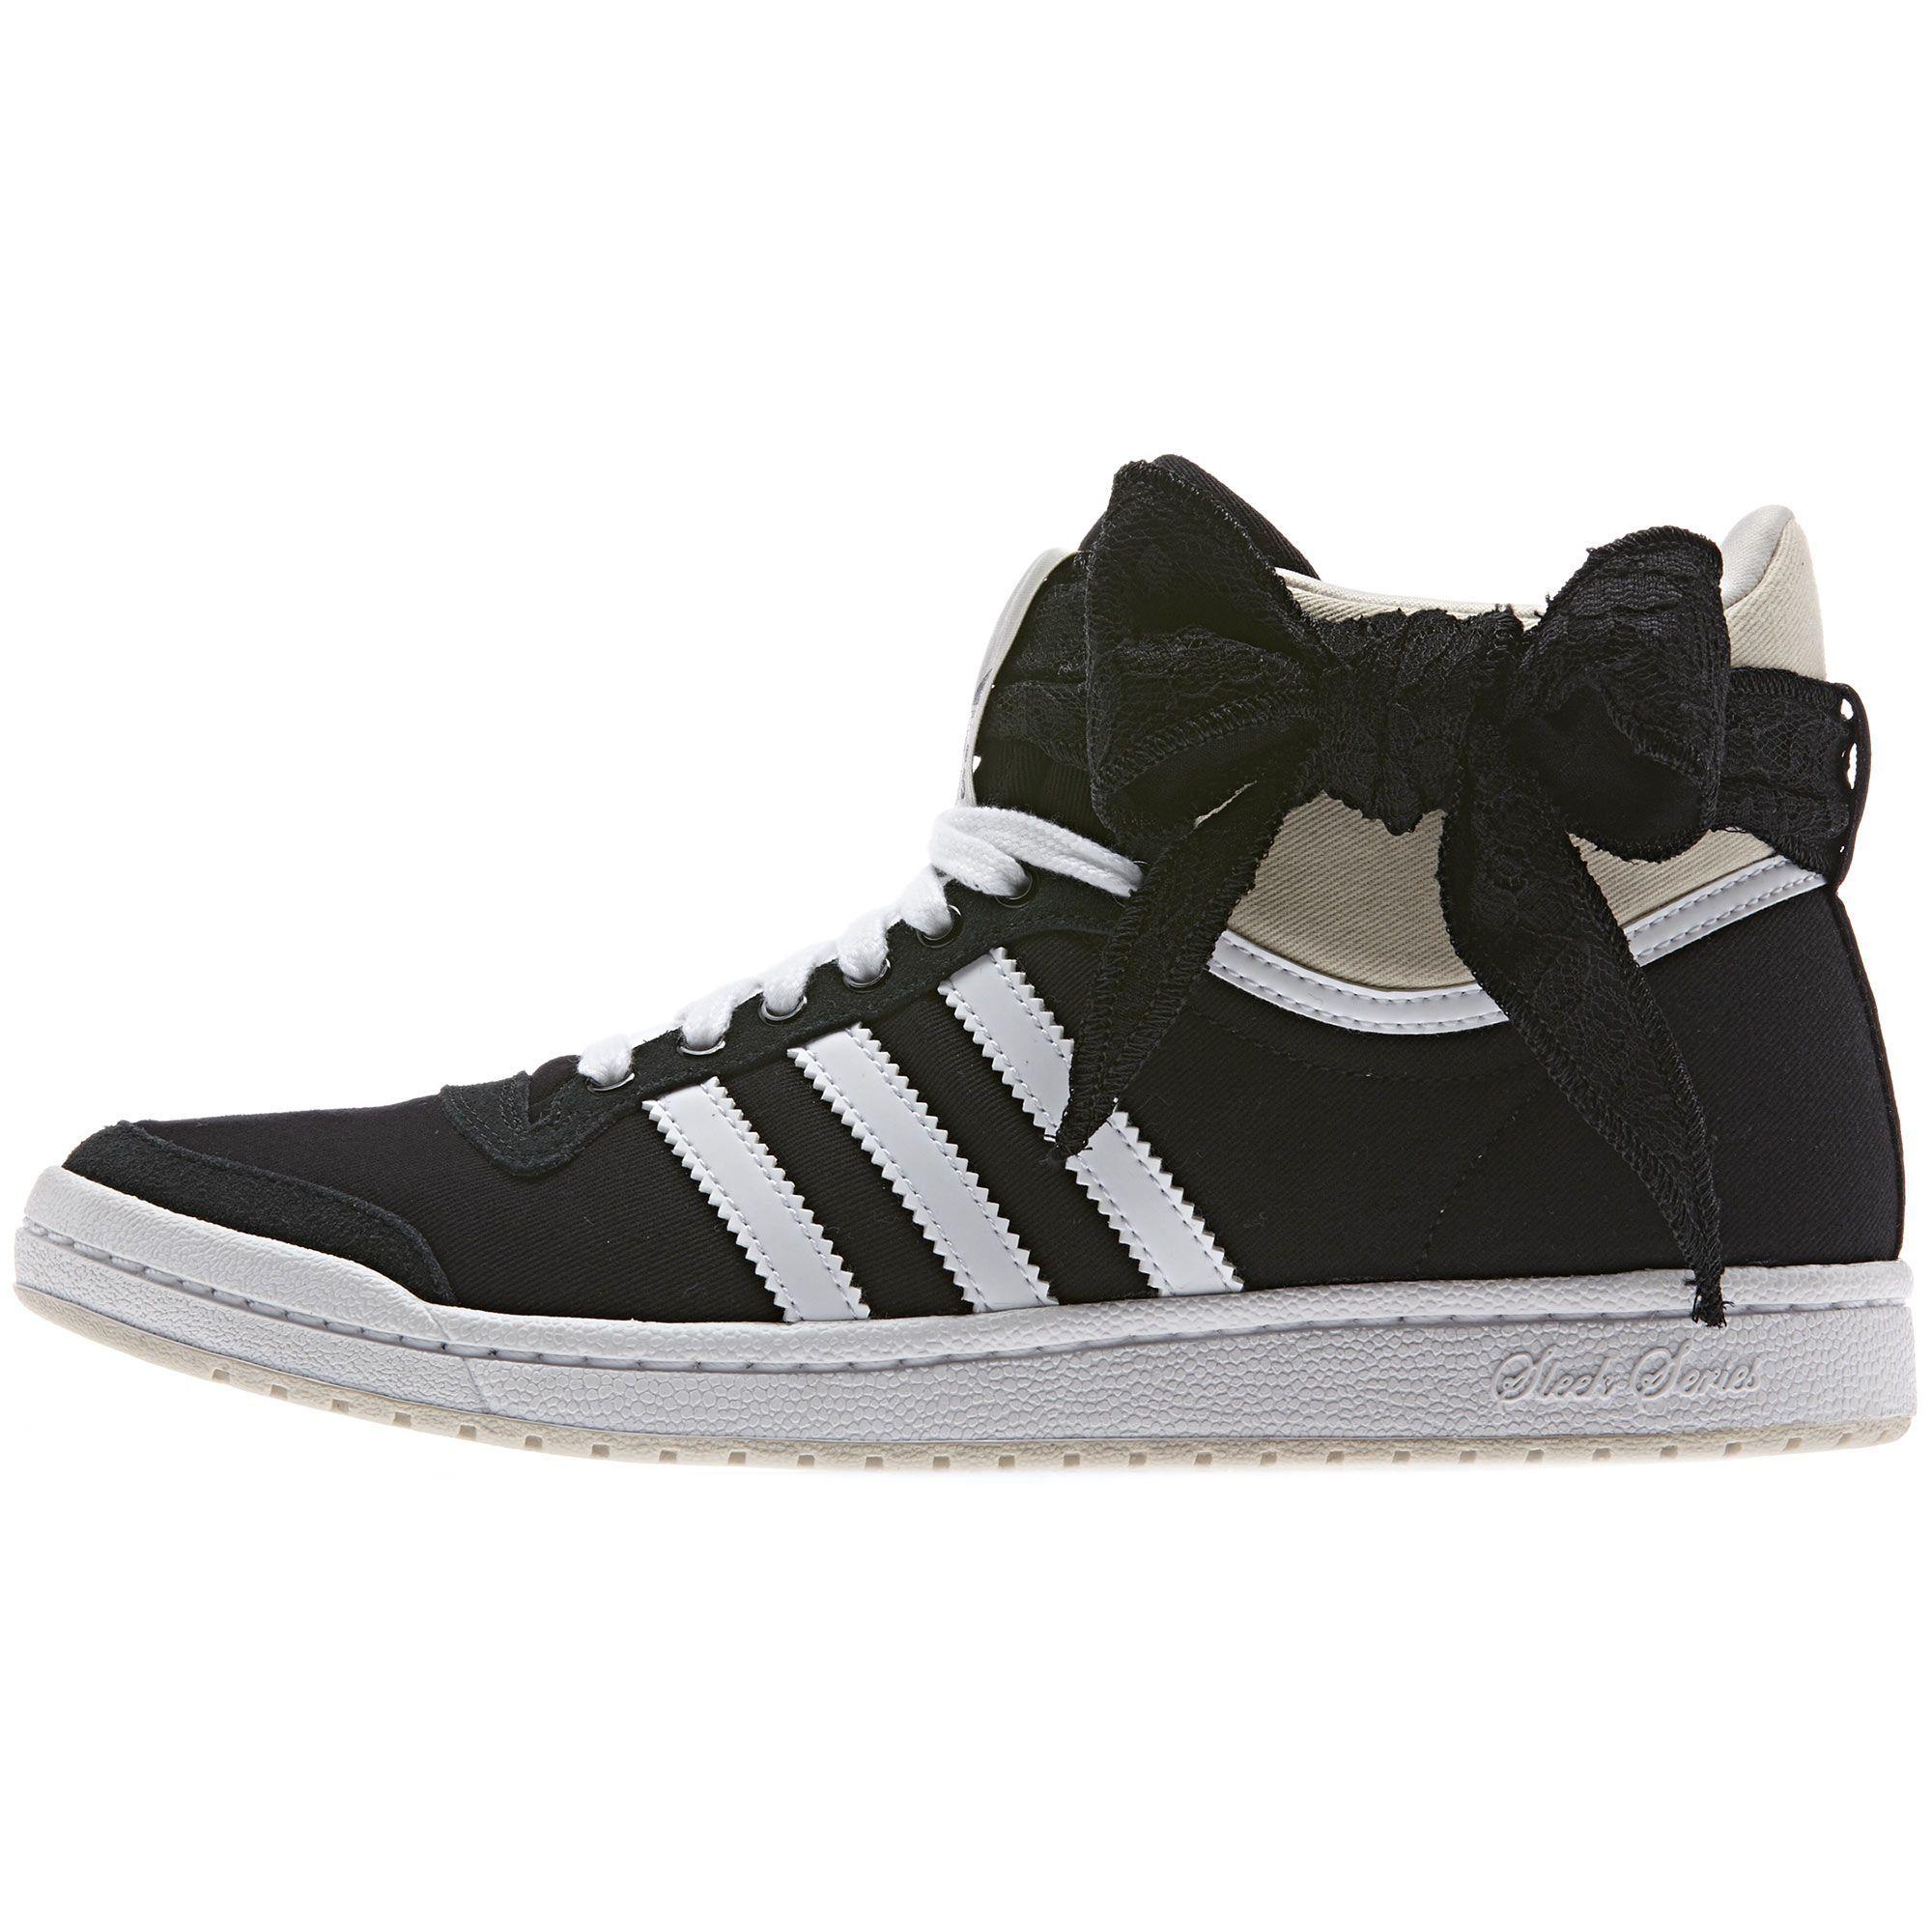 adidas top ten hi sleek bow bandana,Adidas Originals Baskets